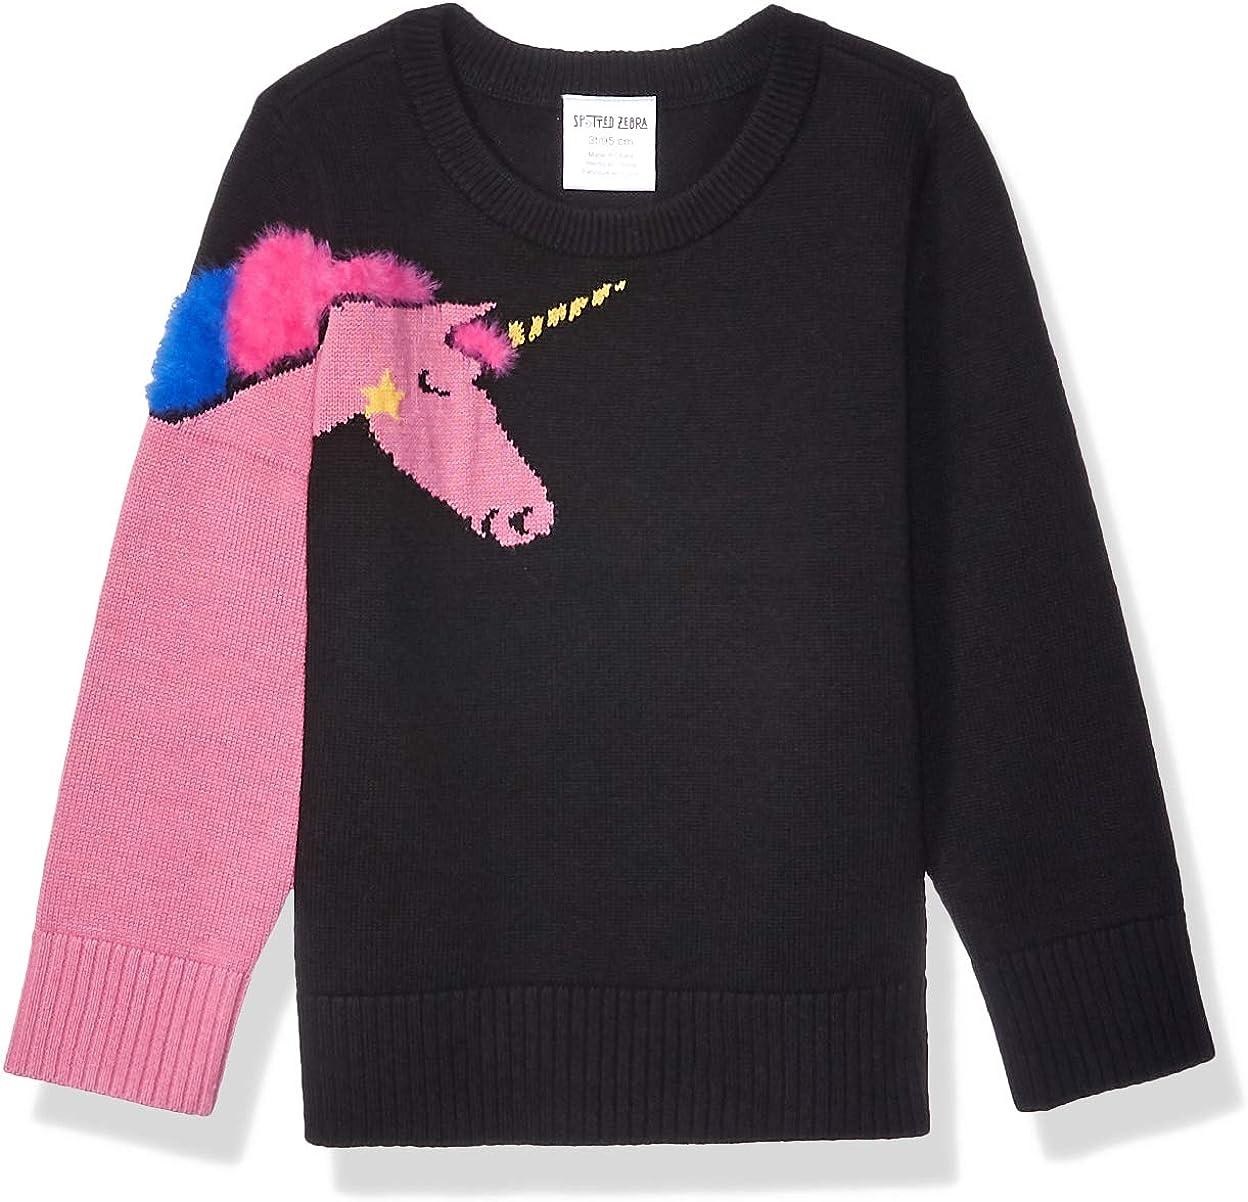 Amazon [Alternative dealer] Brand - Spotted Attention brand Zebra Pullover Crew Sweaters Girls'